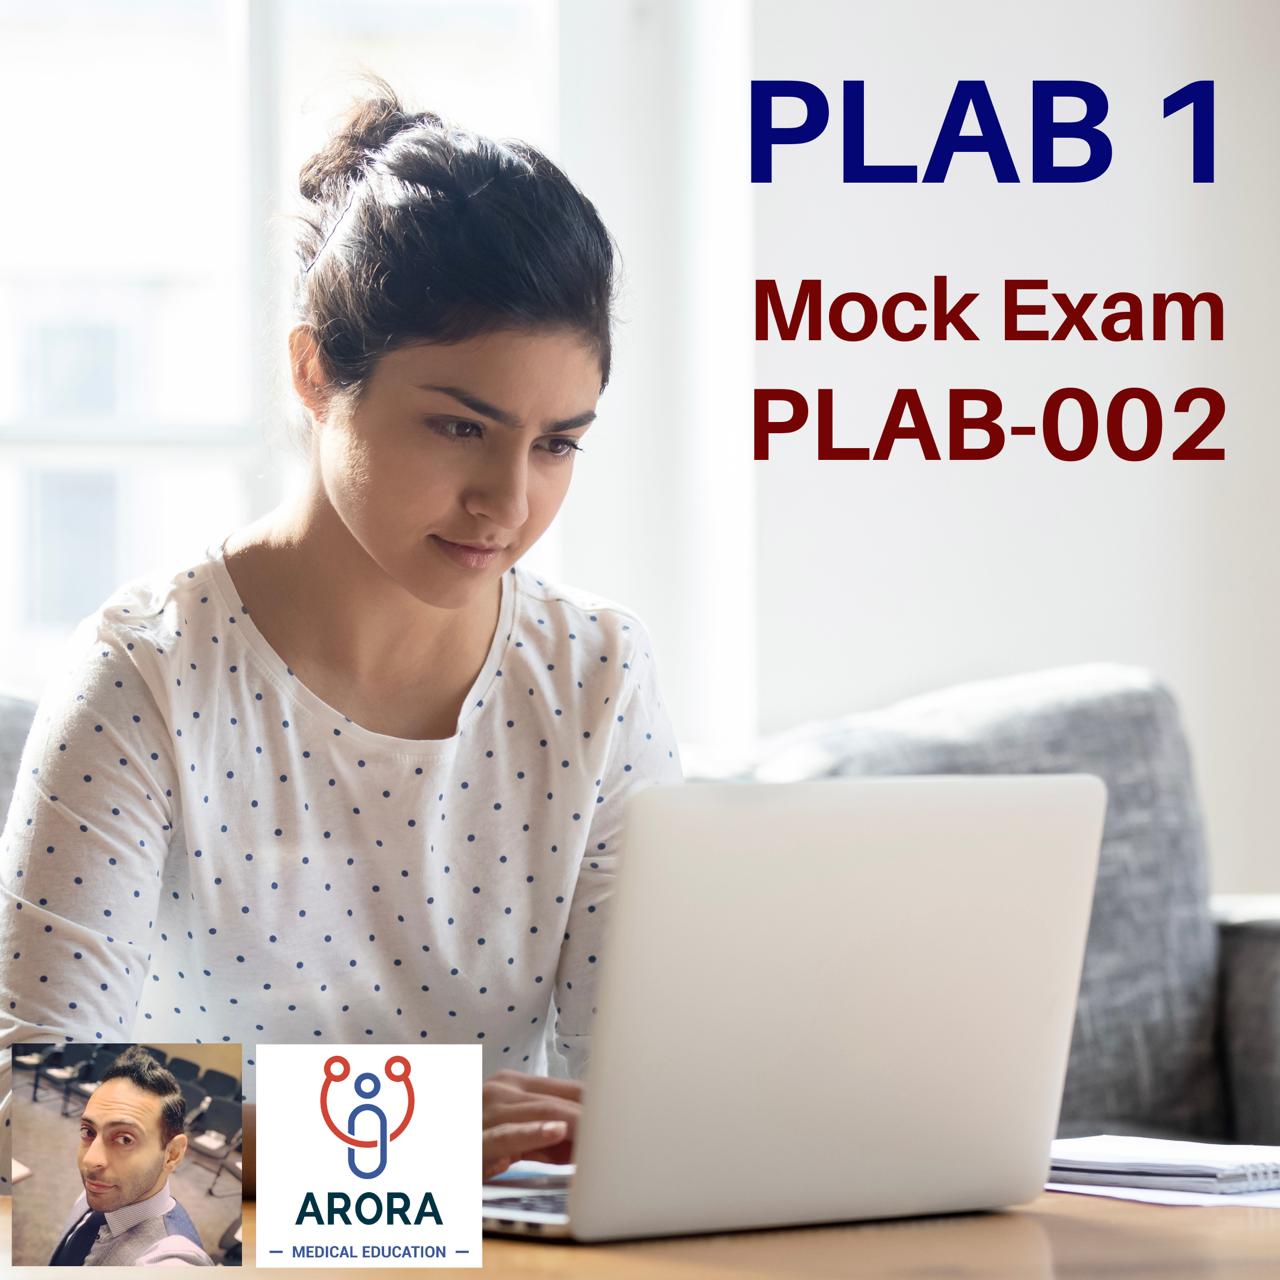 plab1 02 - MRCGP CSA, AKT and PLAB Exam Courses and Online Webinars - Arora Medical Education